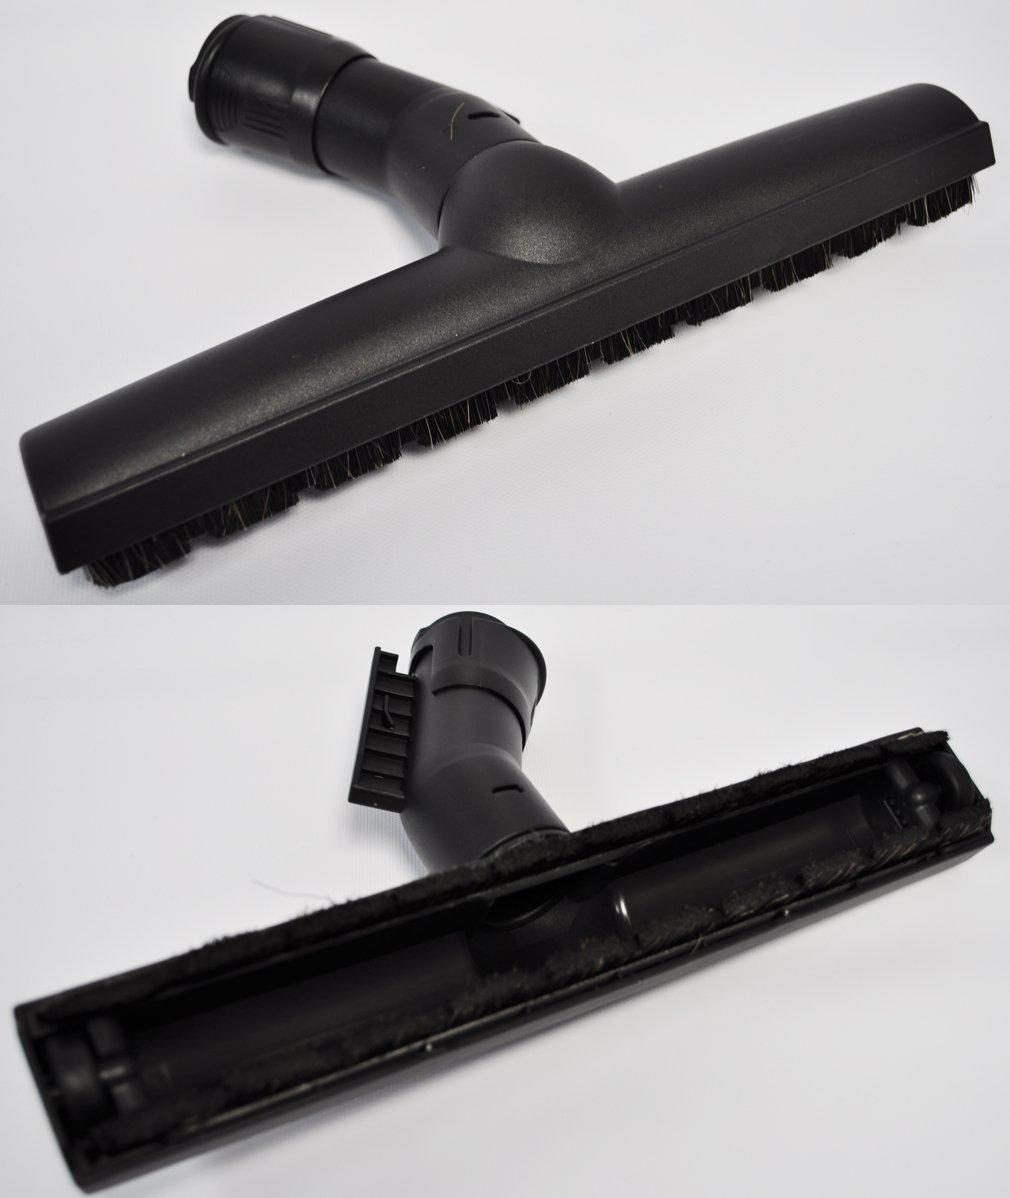 Bosch Premium Series Canister Vacuum Floor Brush Assembly